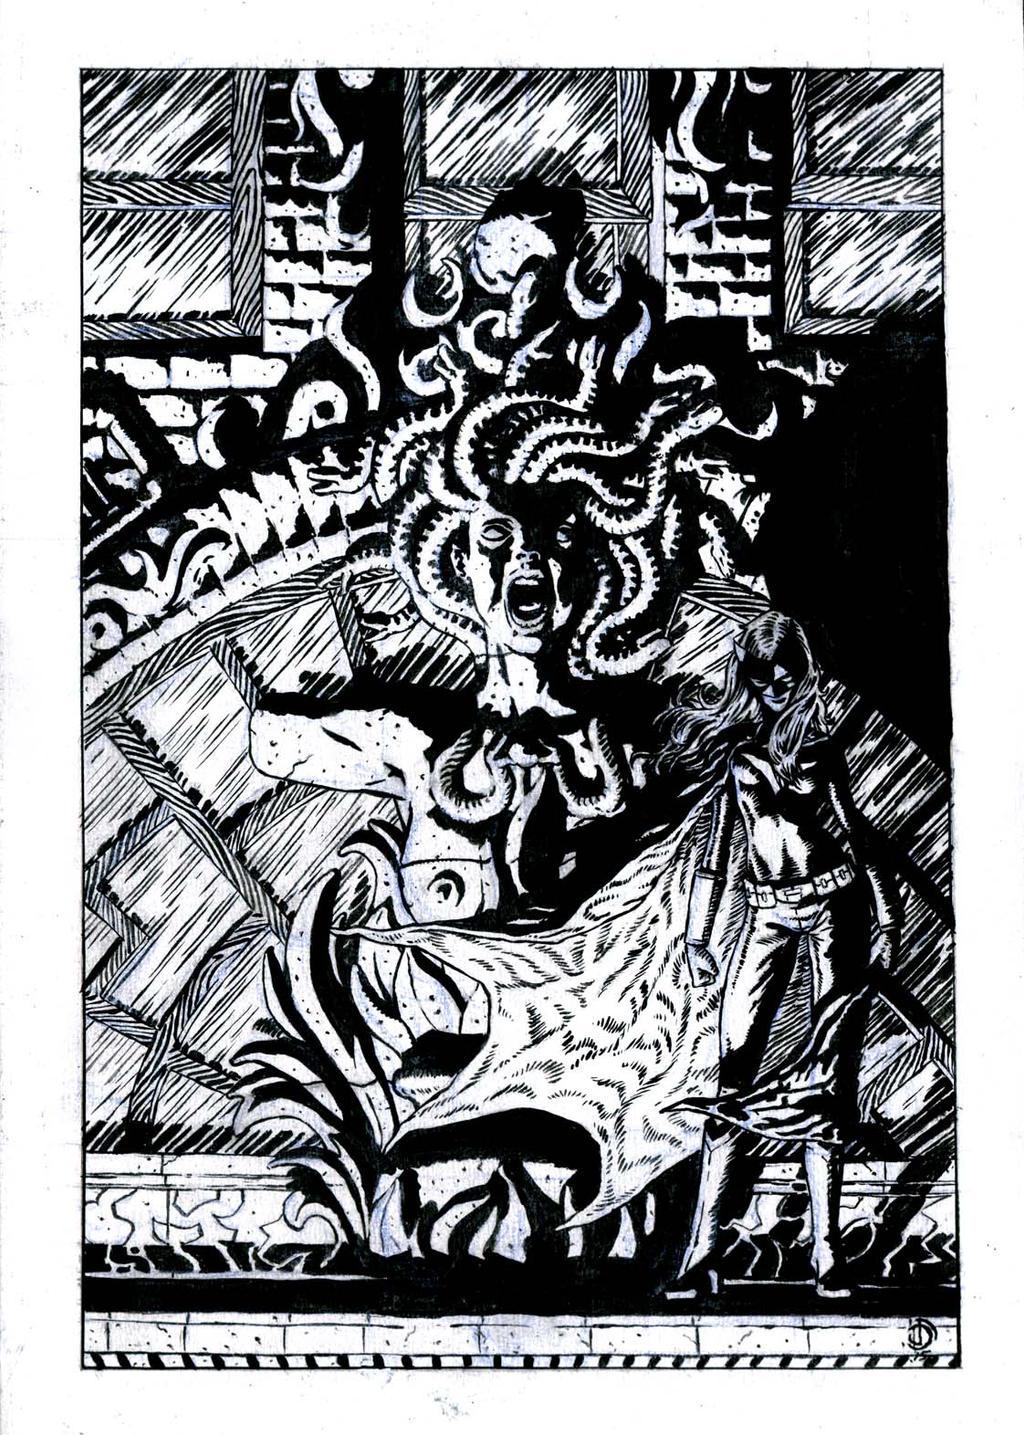 SanEspina Batwoman Cover inks by santiagocomics